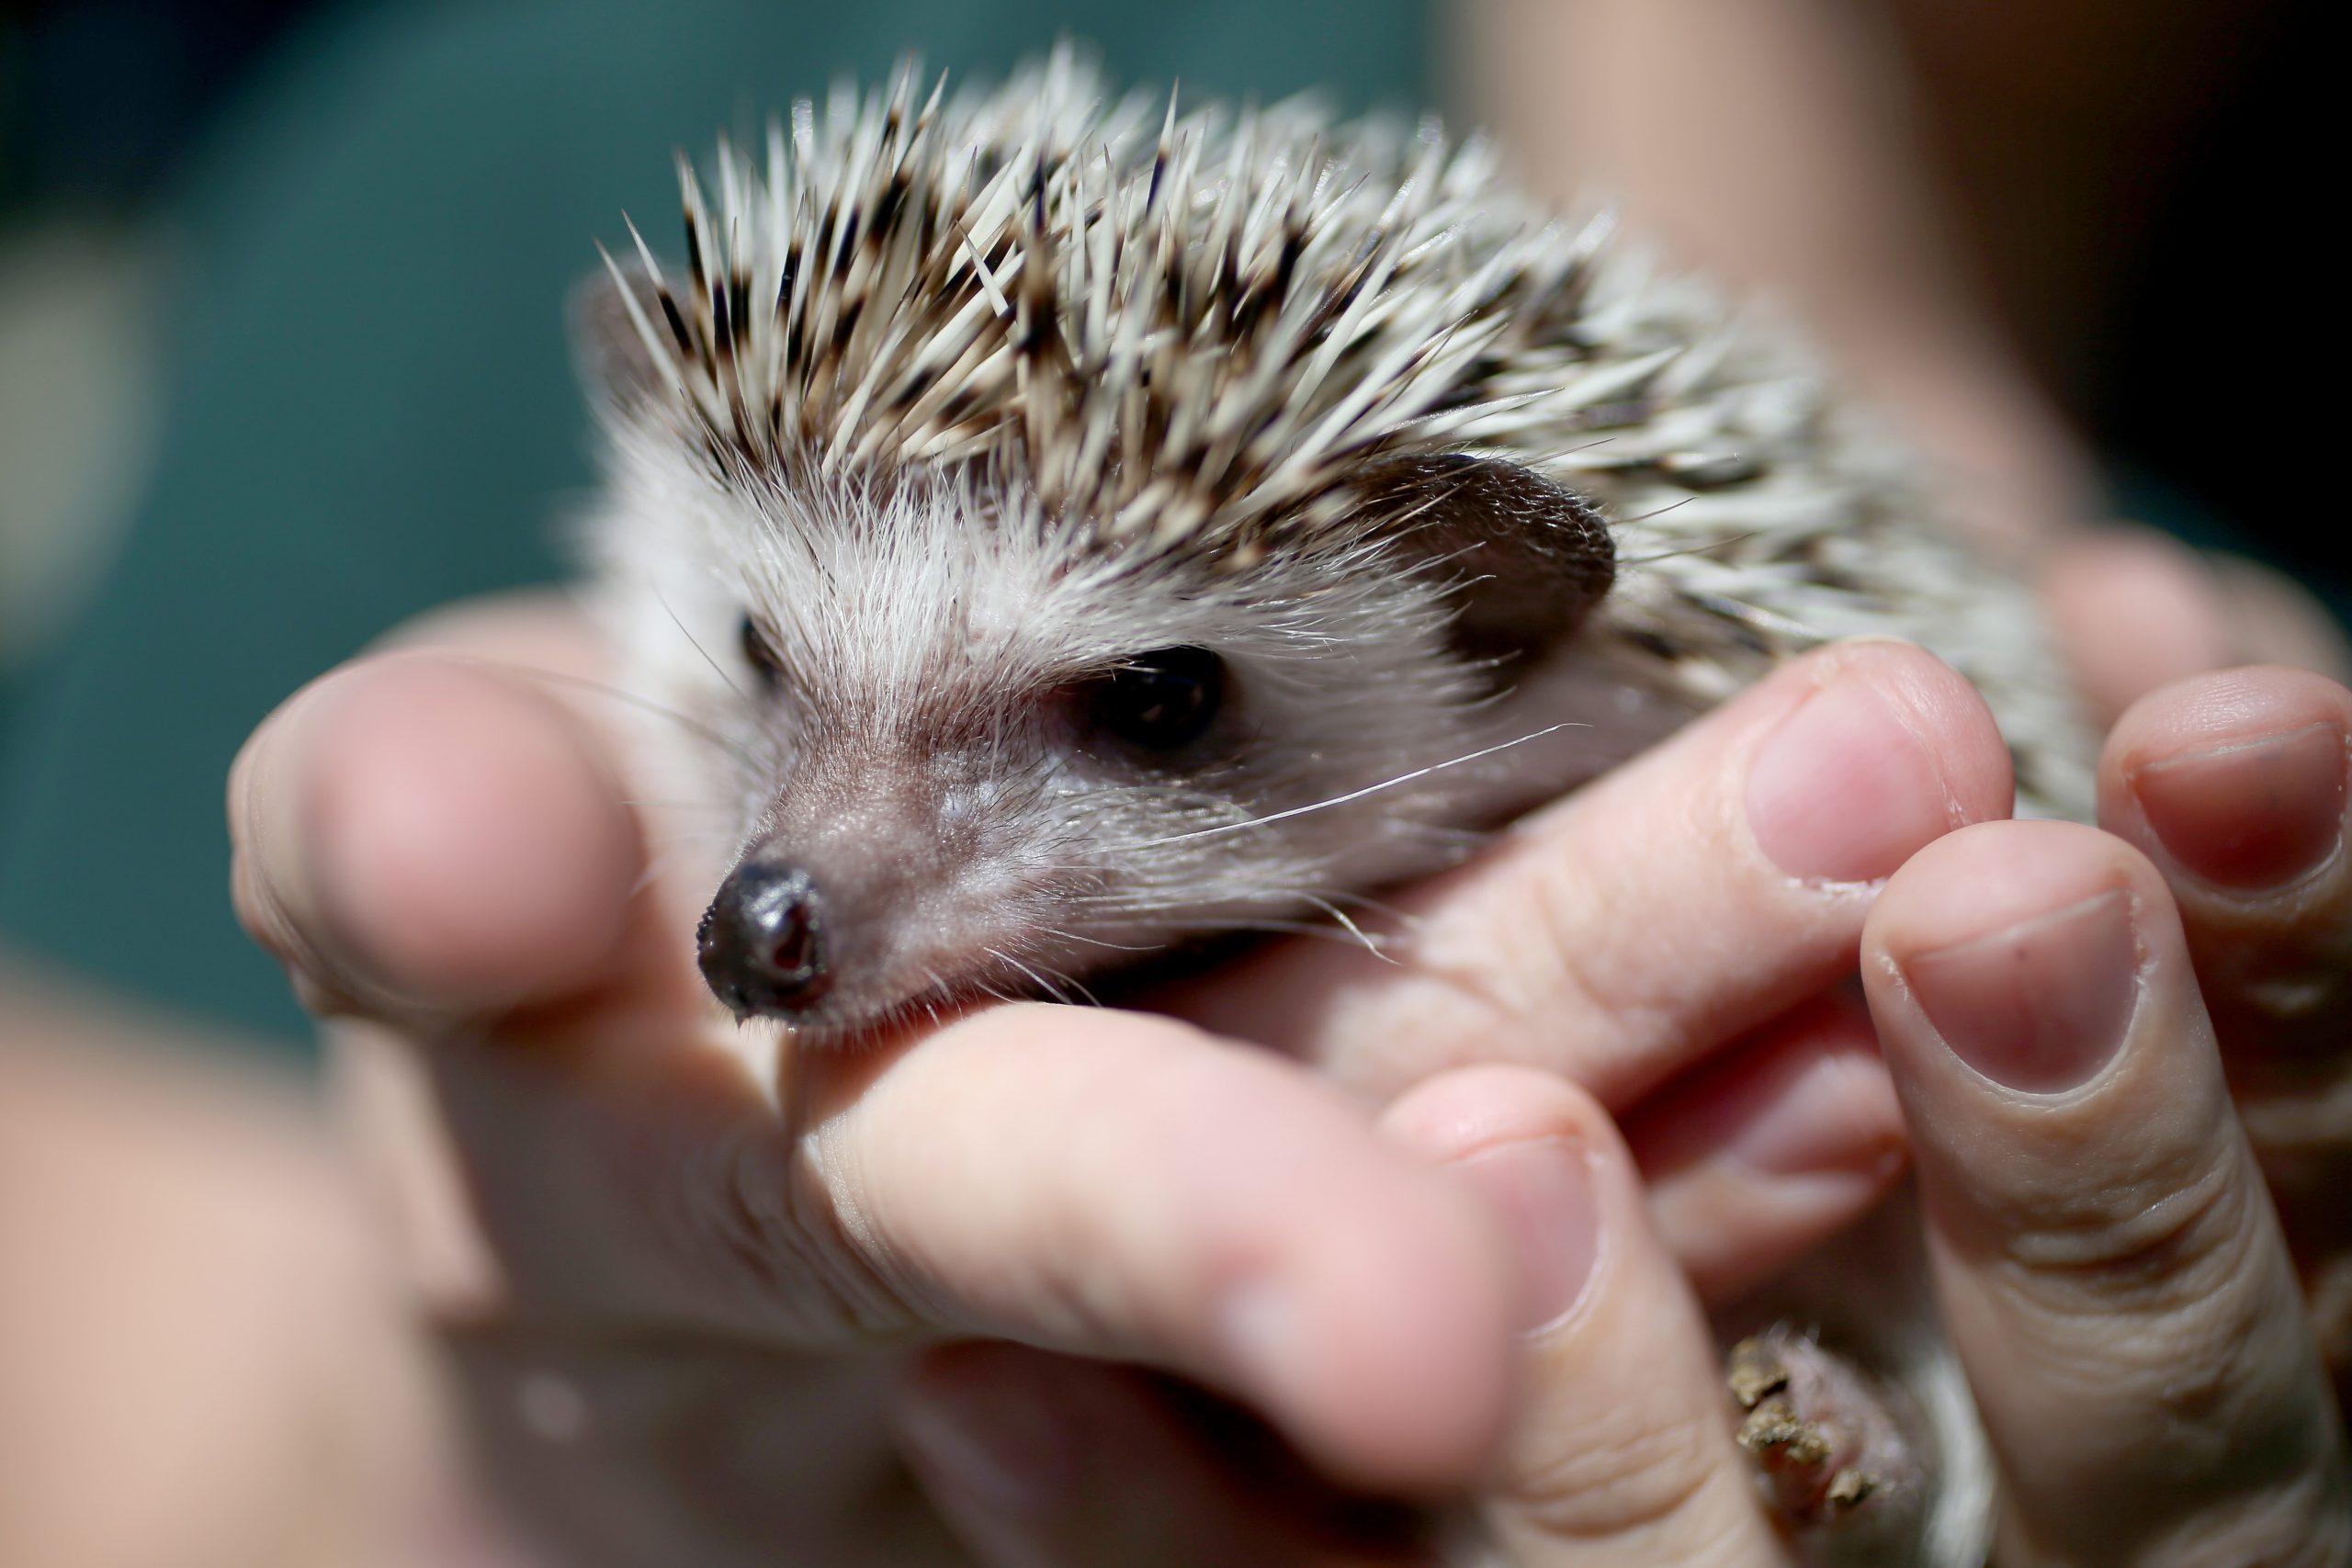 No lo notarán: Zoológico reemplaza a un pequeño erizo con un cepillo